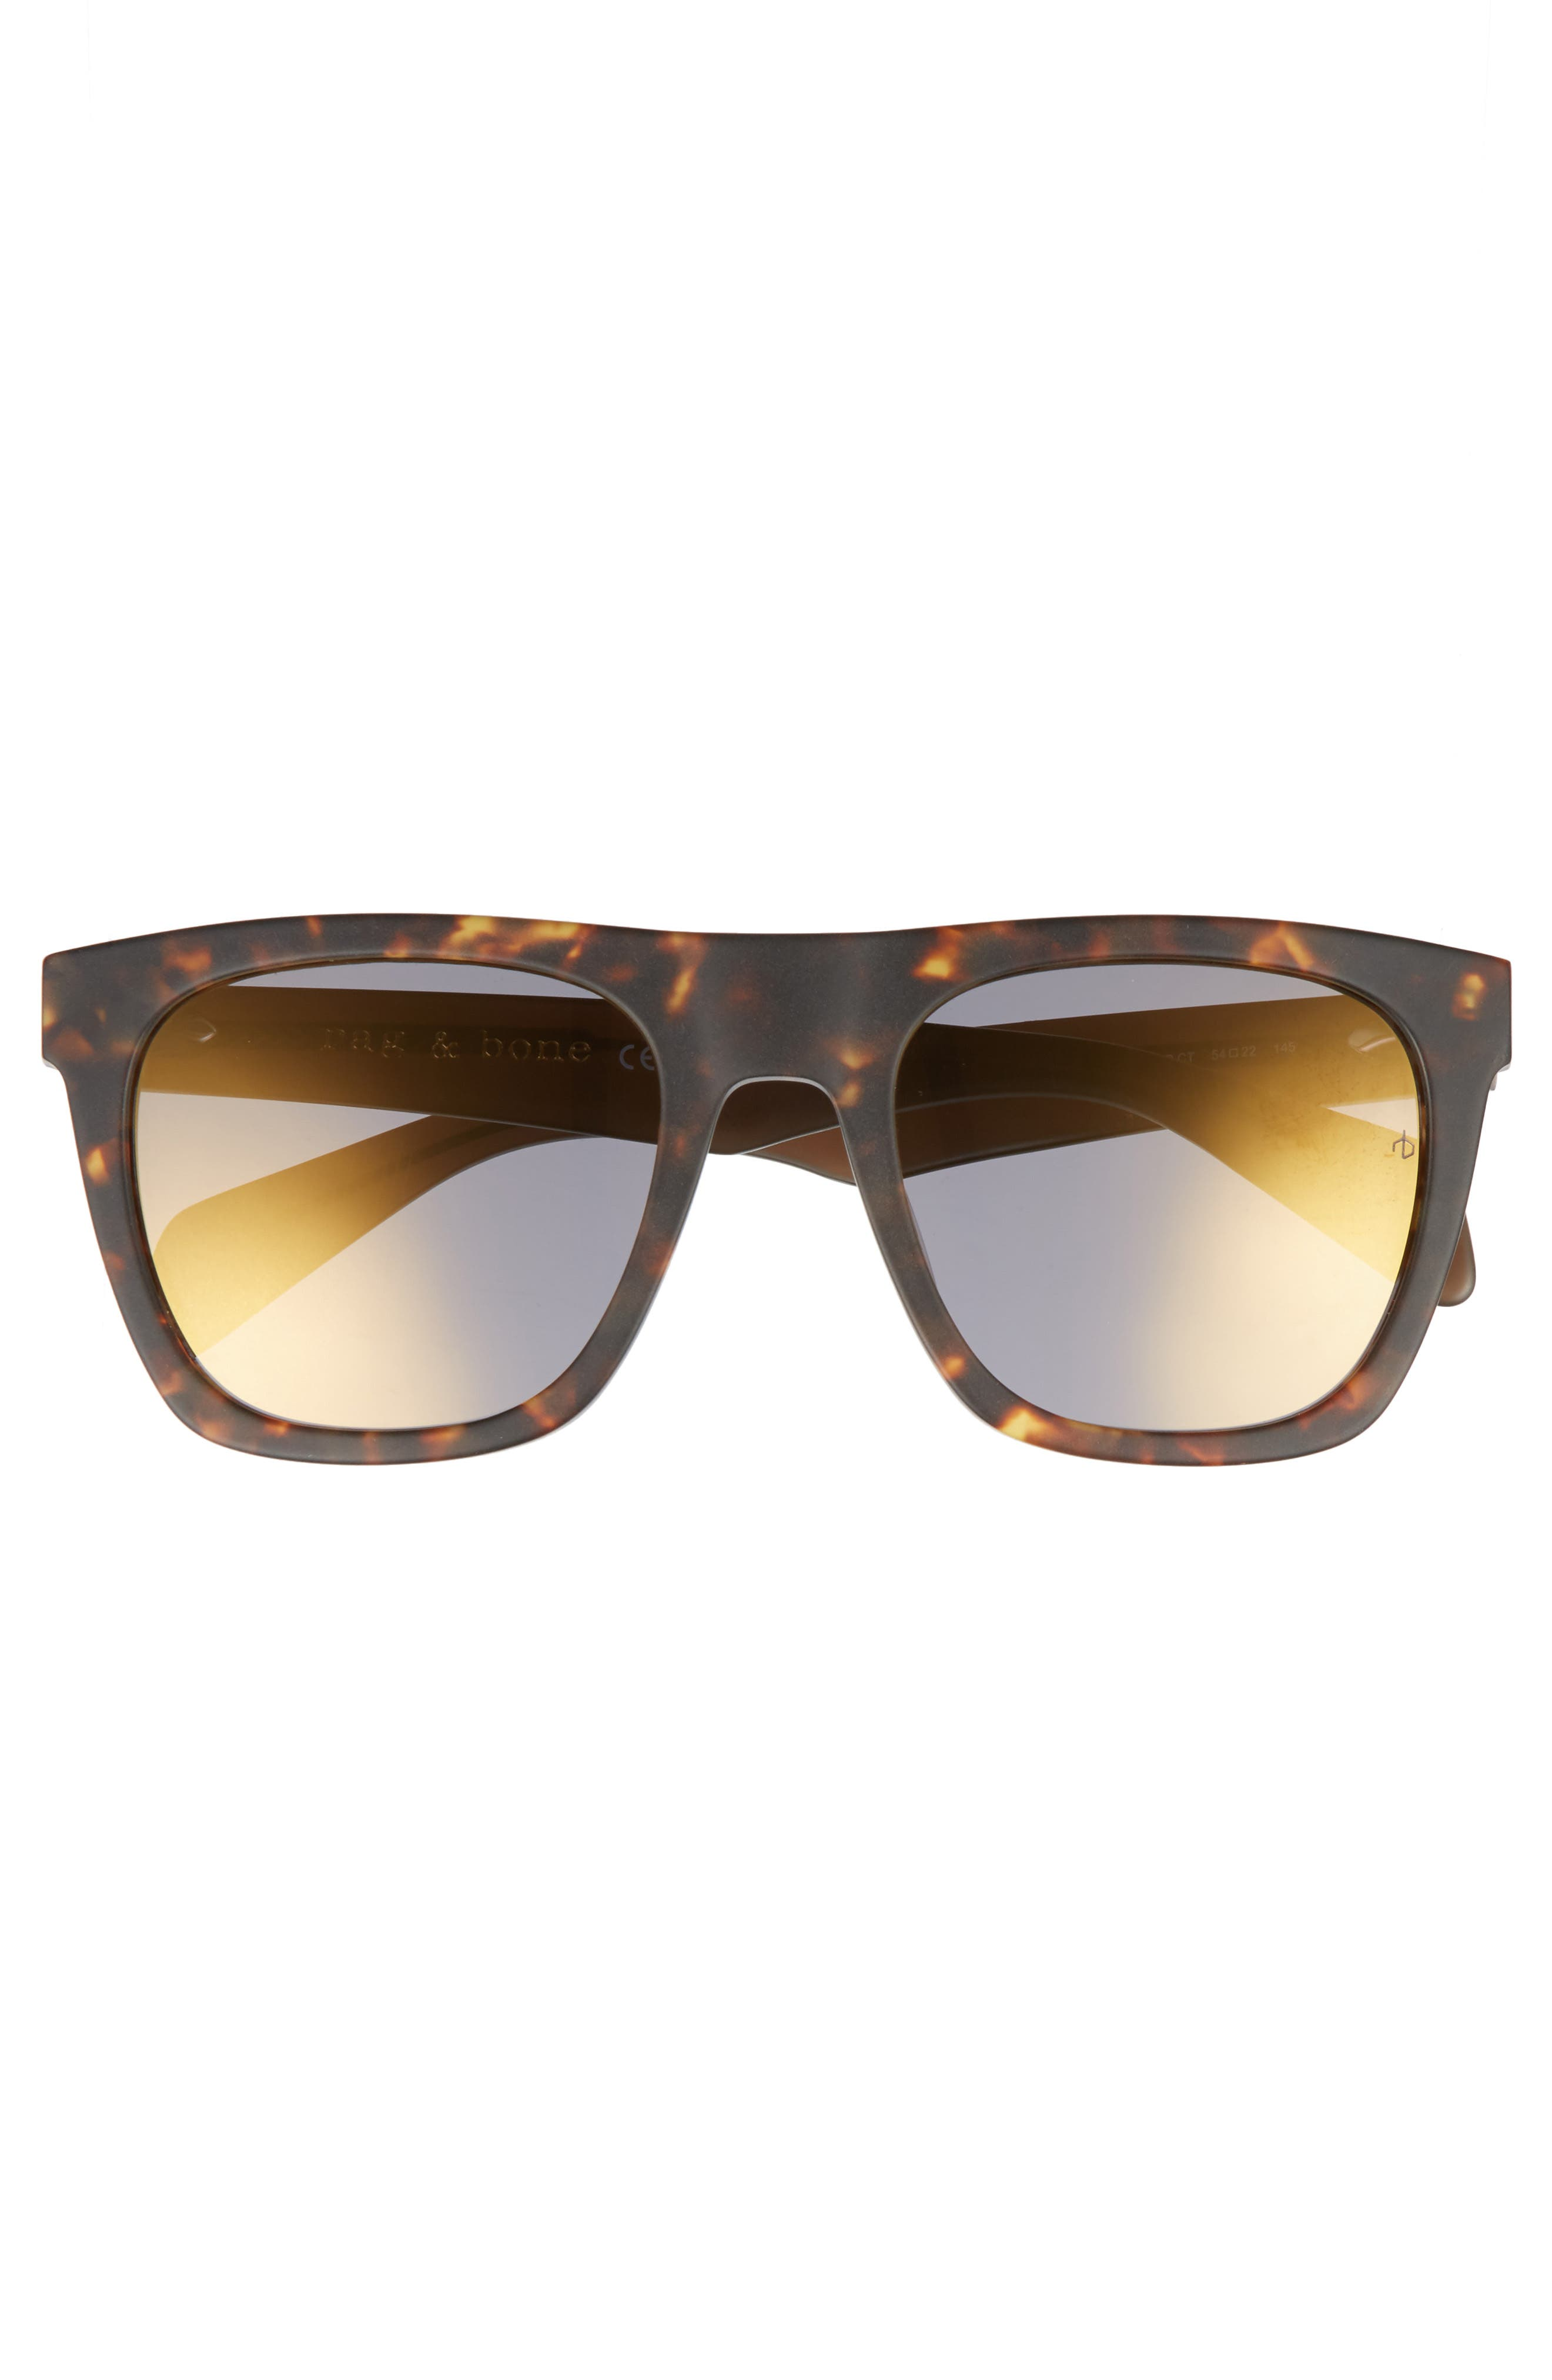 54mm Sunglasses,                             Alternate thumbnail 2, color,                             210